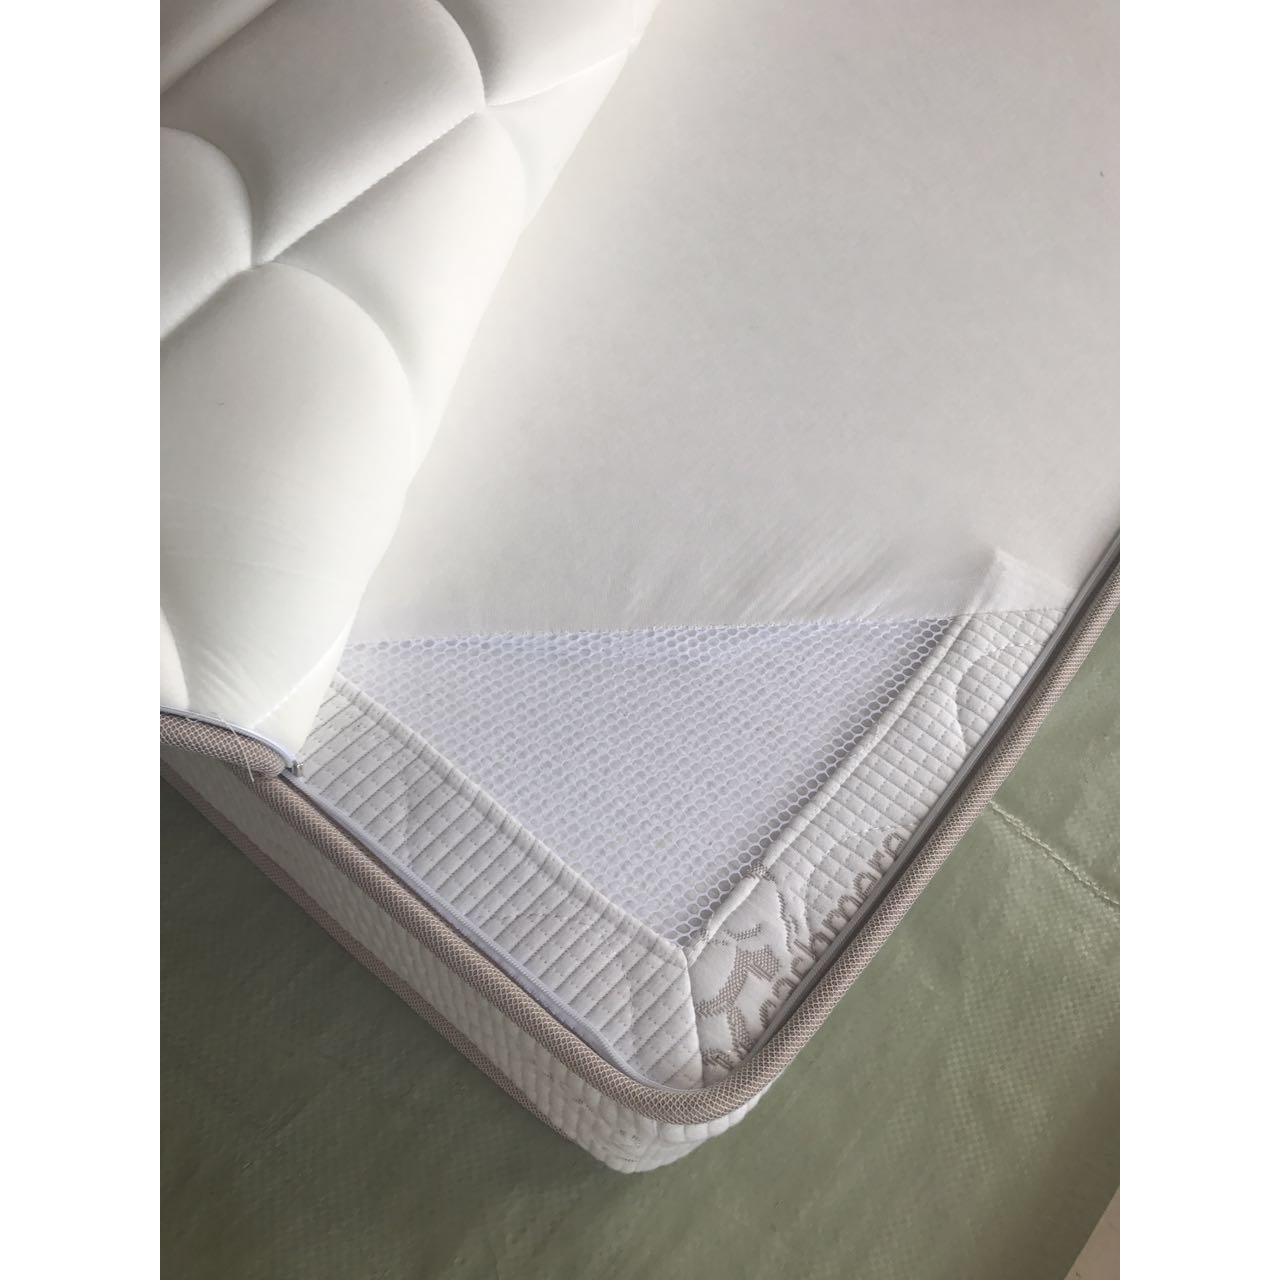 3e棕床垫价格-今日最新3e棕床垫价格行情走势 - 阿里巴巴